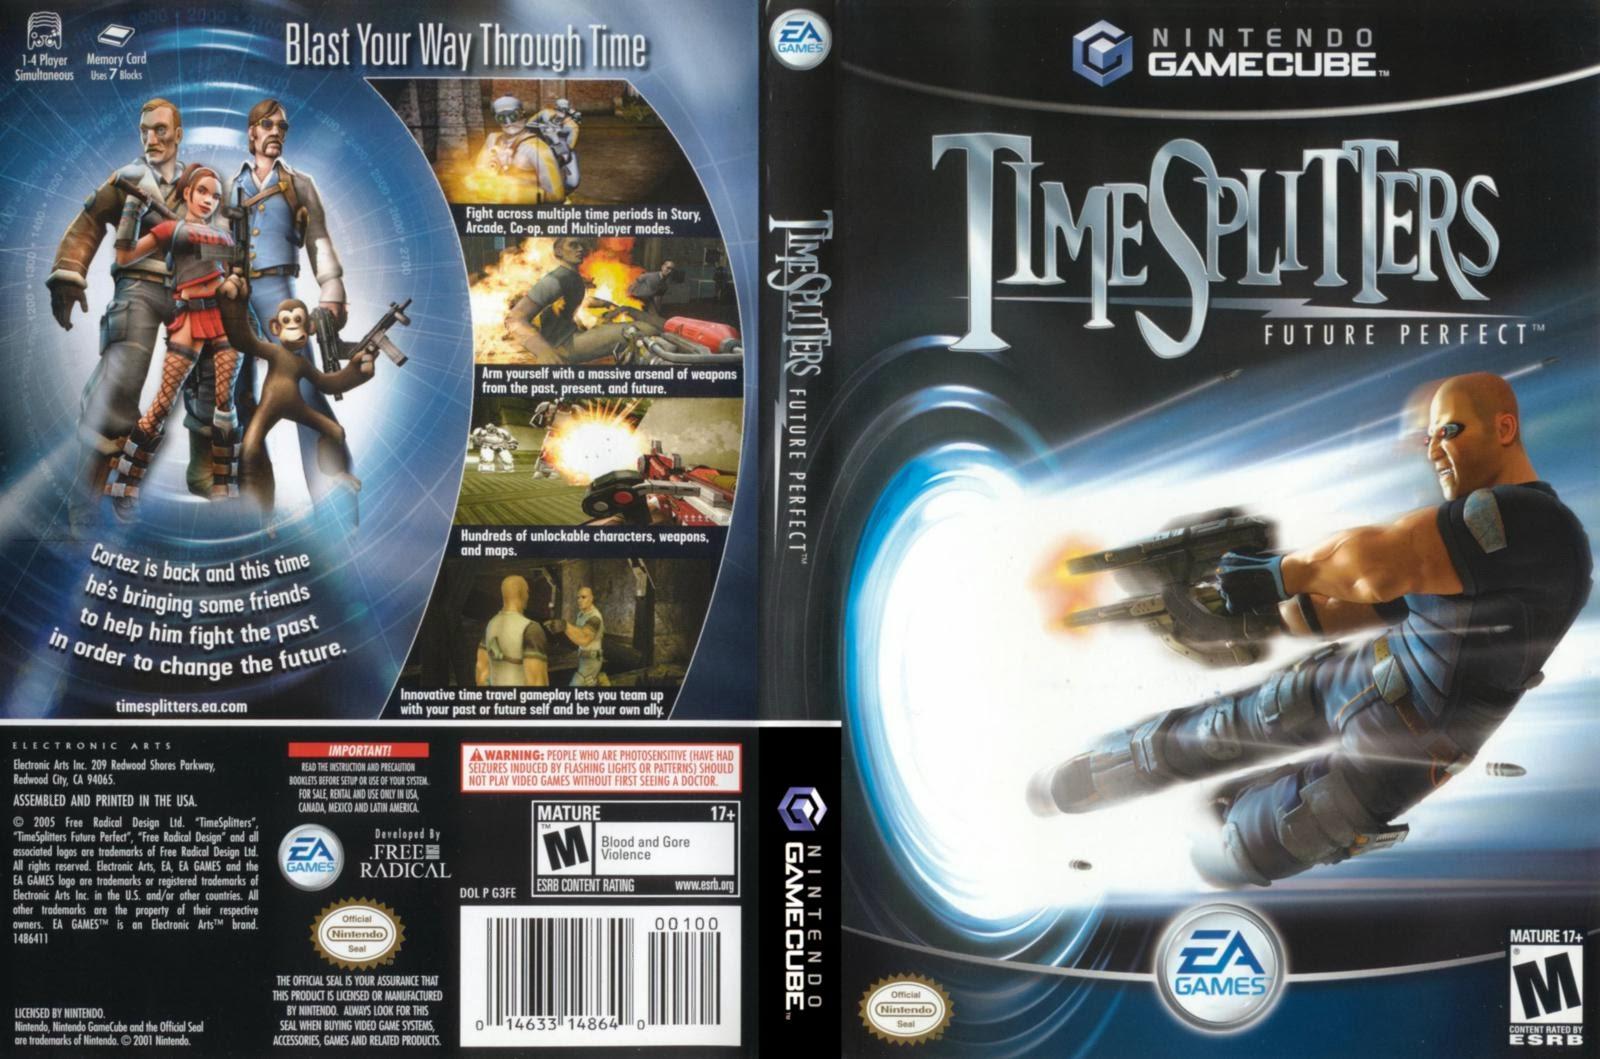 Analise: TimeSplitters: Future Perfect